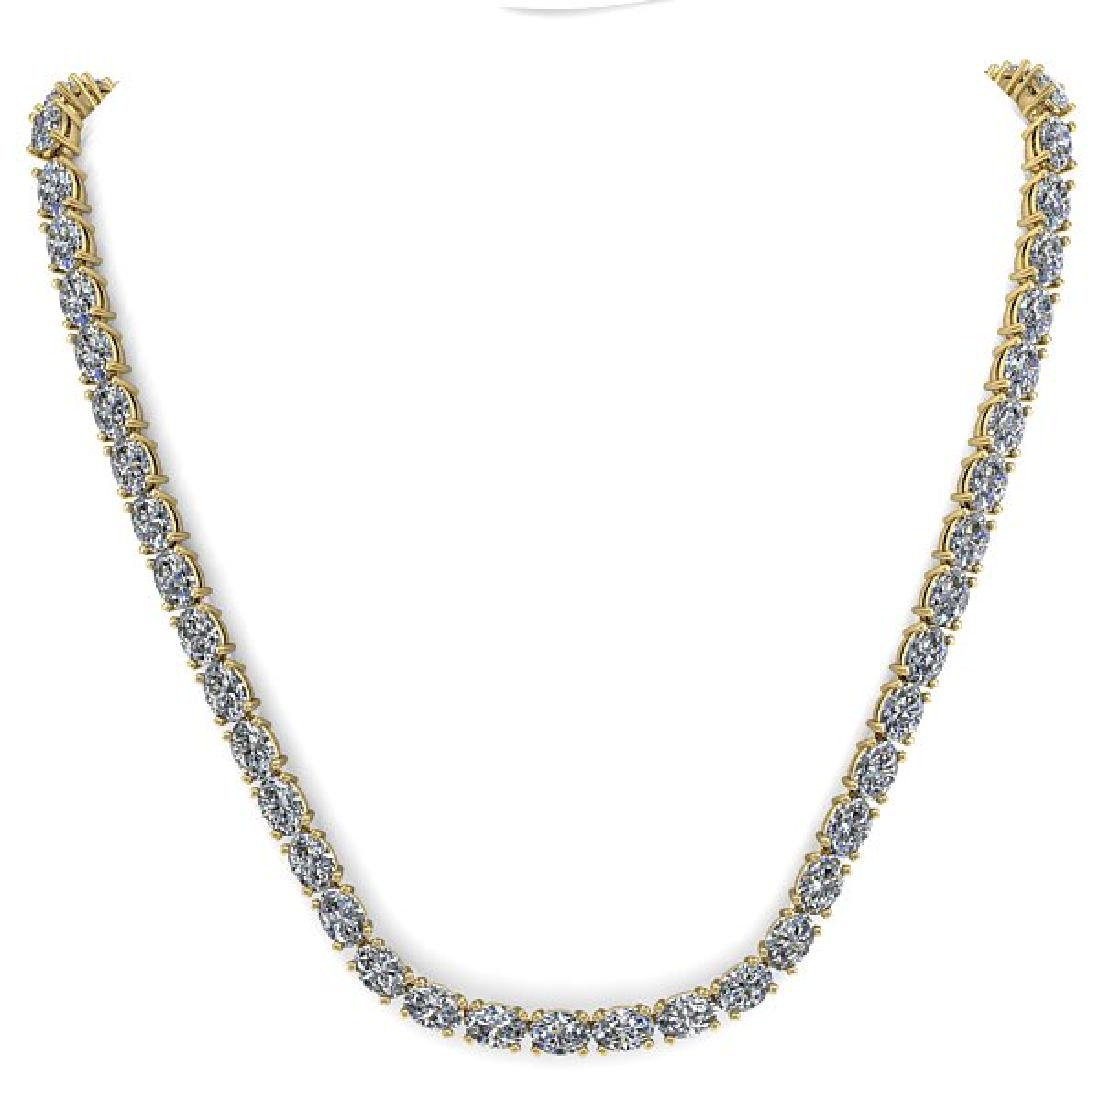 26 CTW Oval Cut Certified SI Diamond Necklace 18K - 3